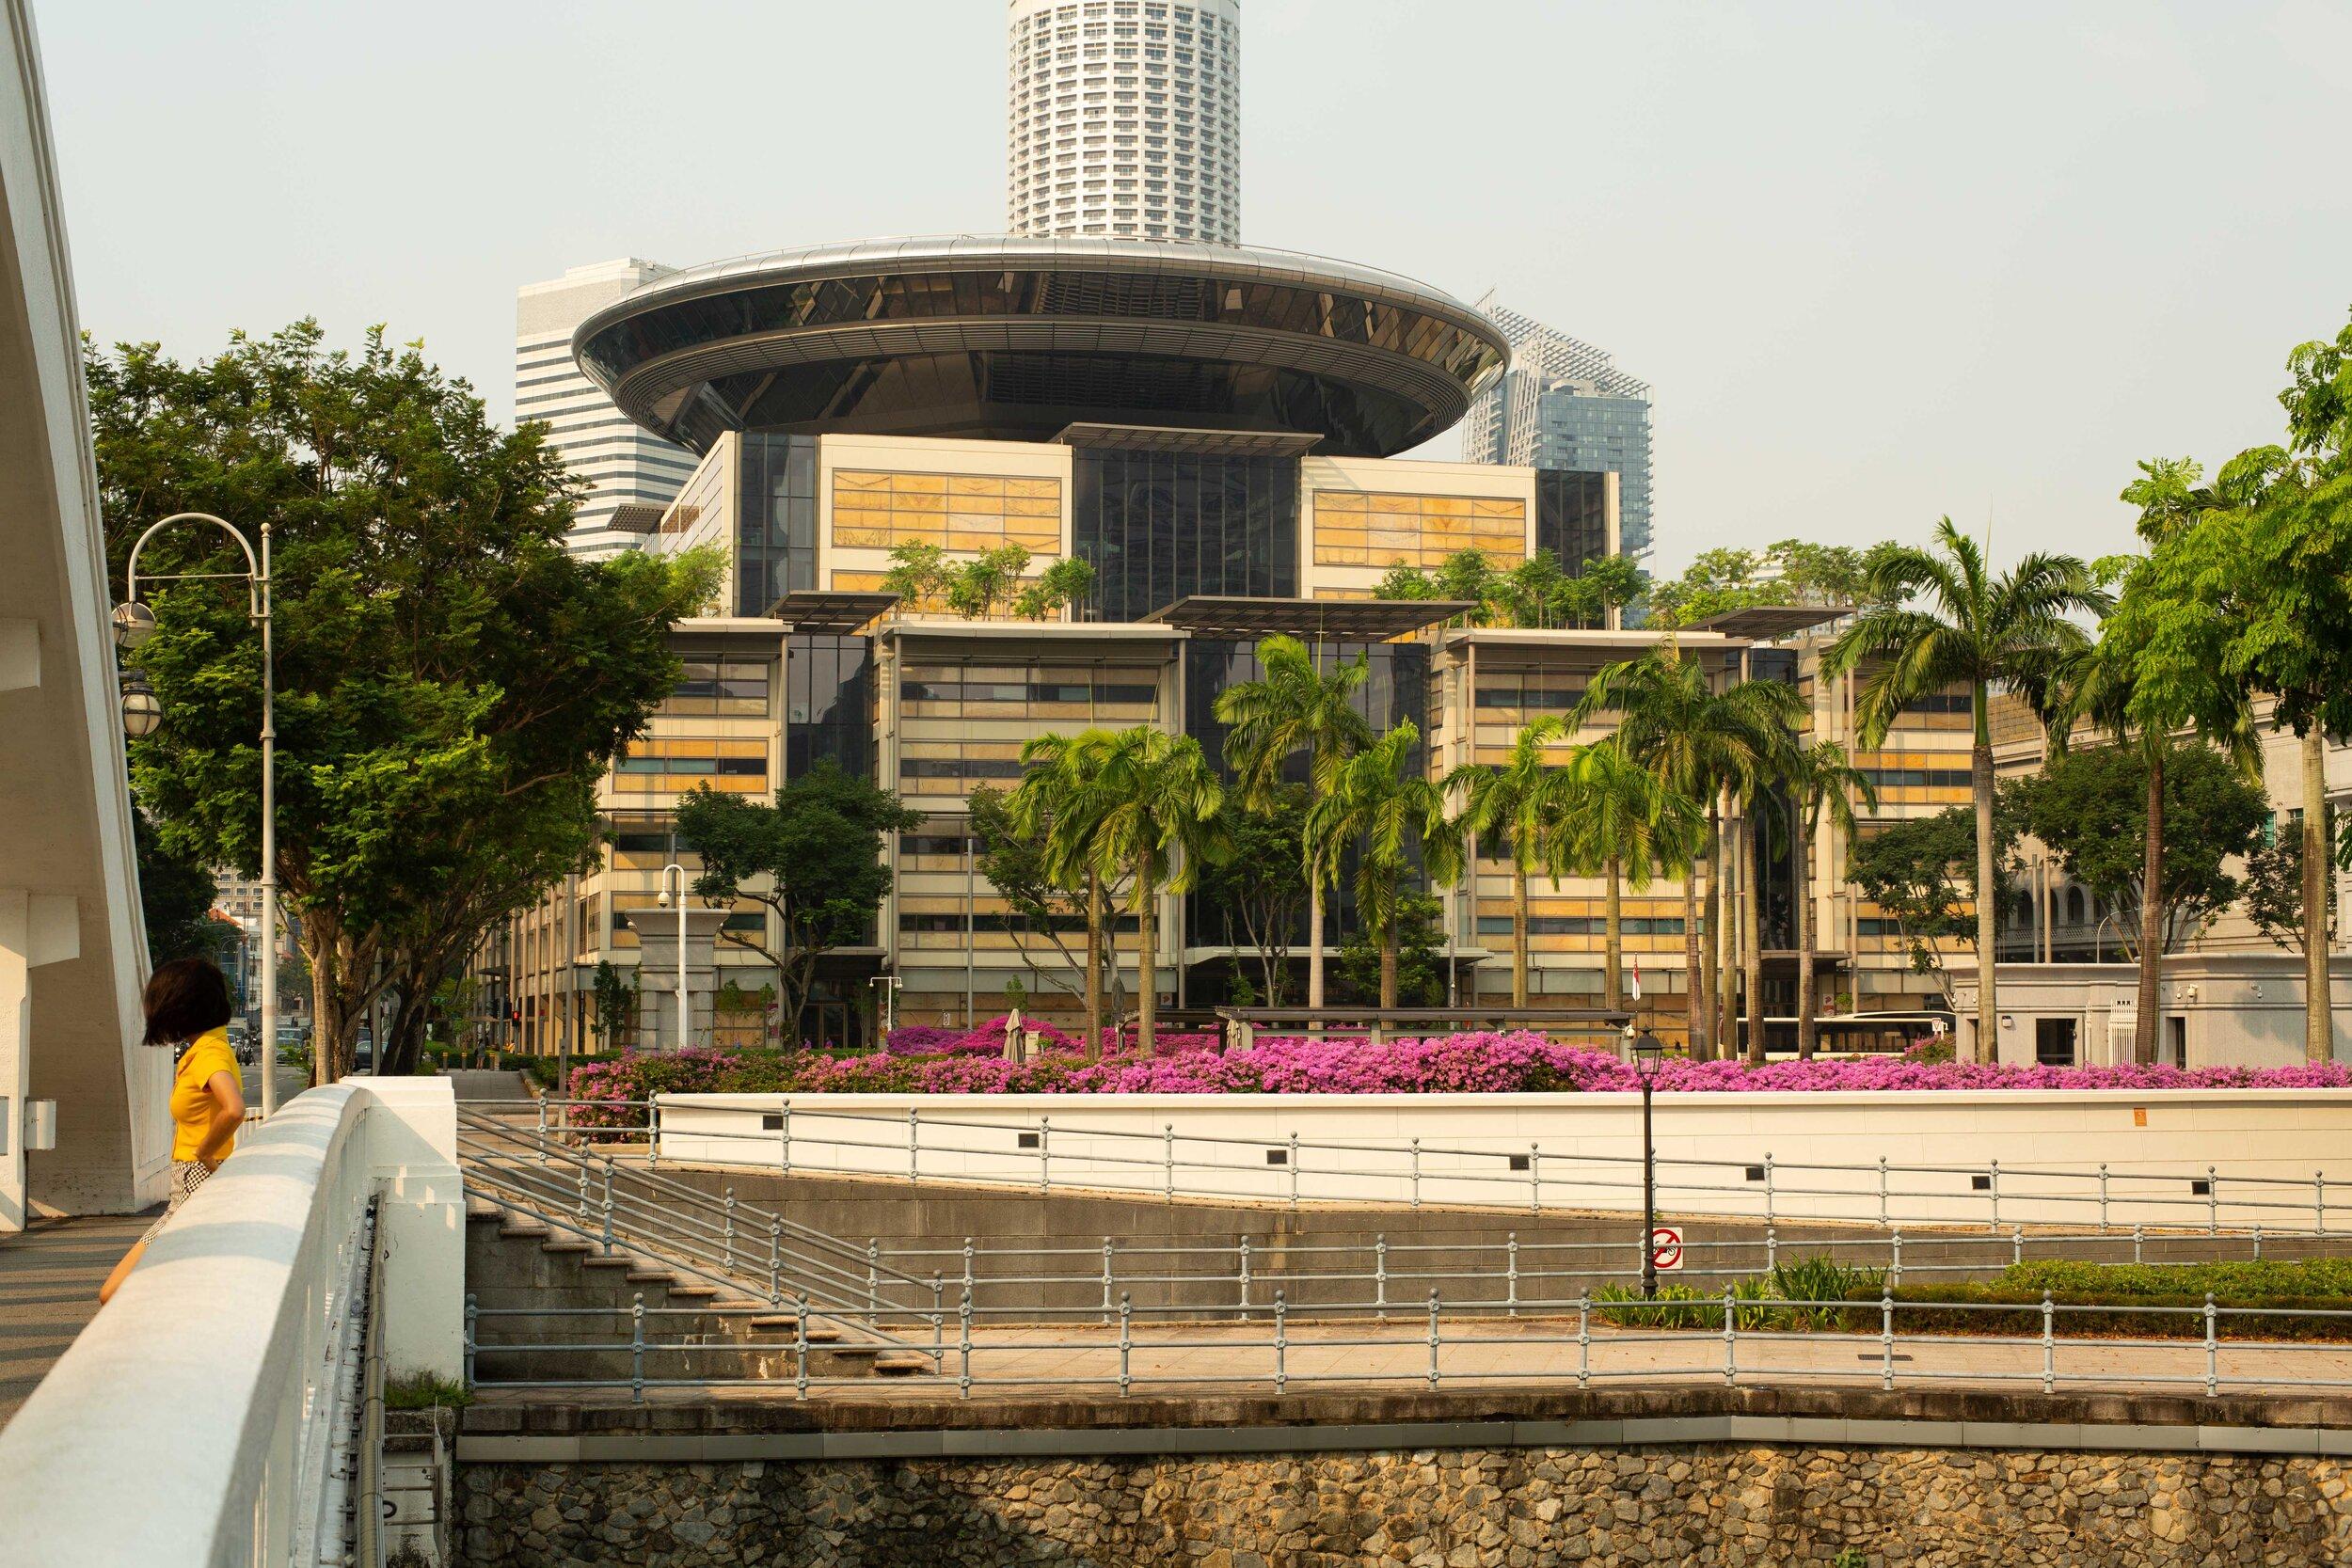 The Singapore Supreme Court, image taken from the Elgin Bridge